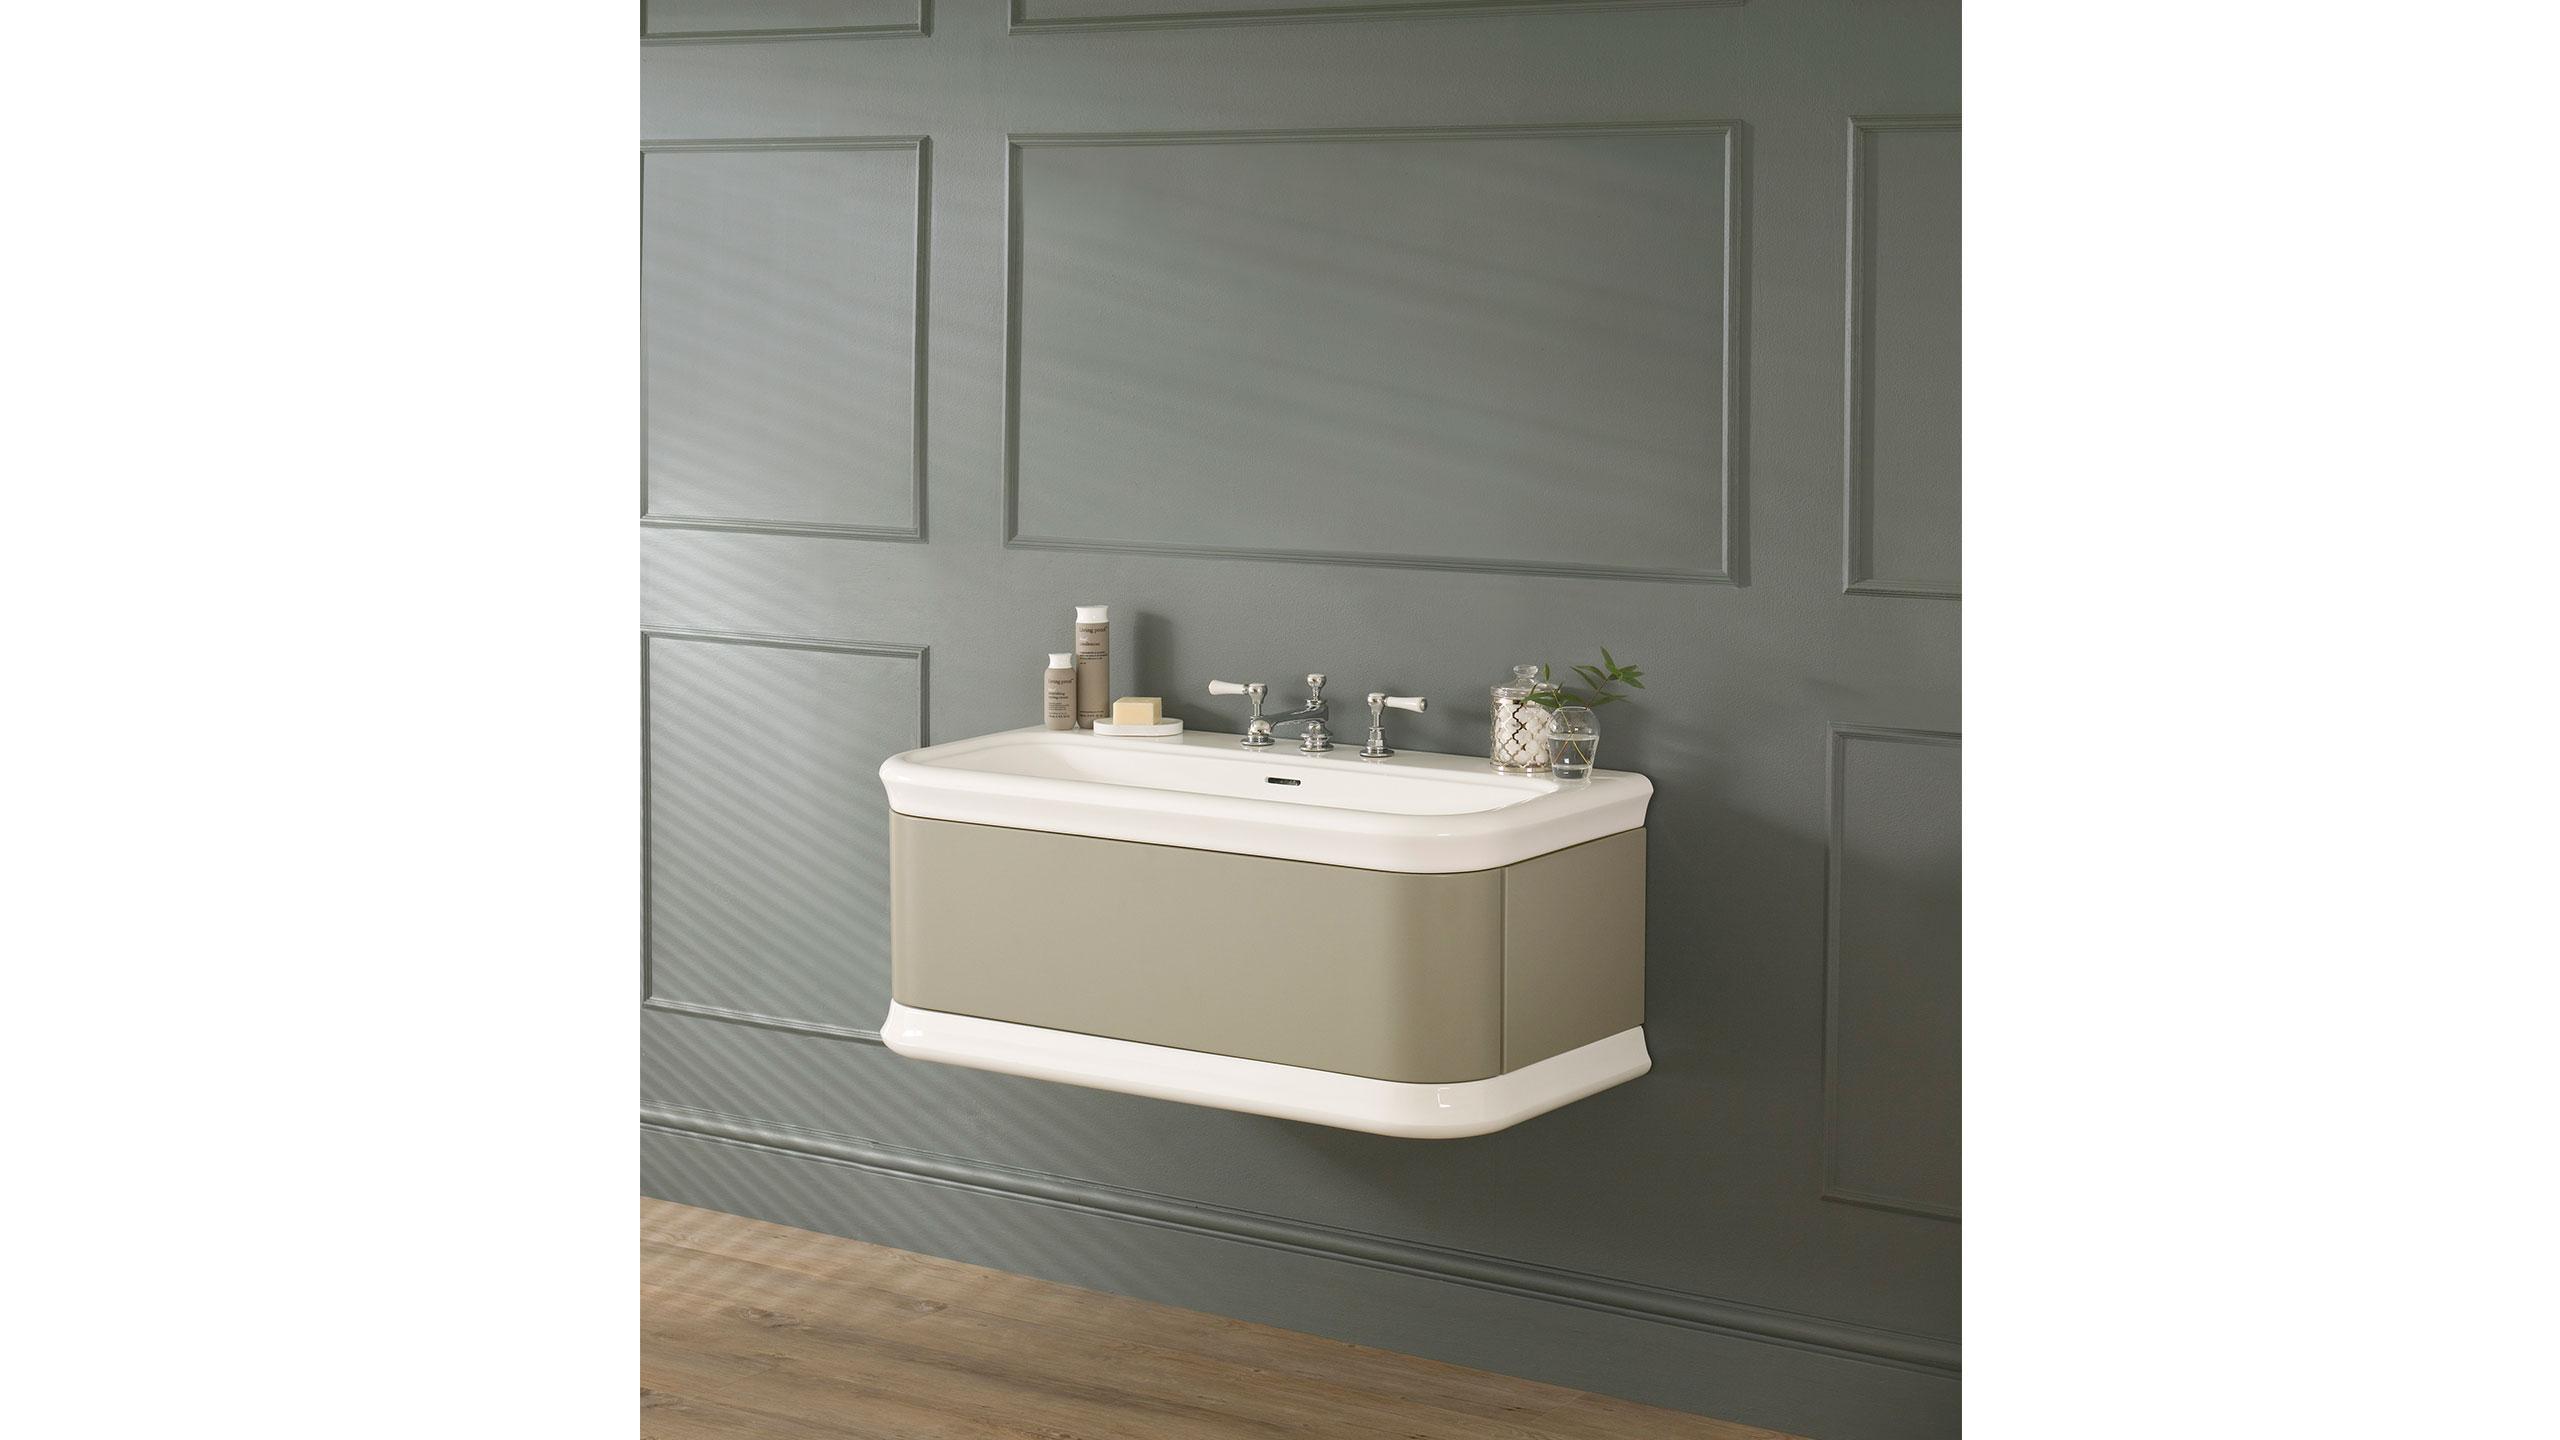 https://designerpages.s3.amazonaws.com/assets/60997131/Lario-100-volo-grey.jpg